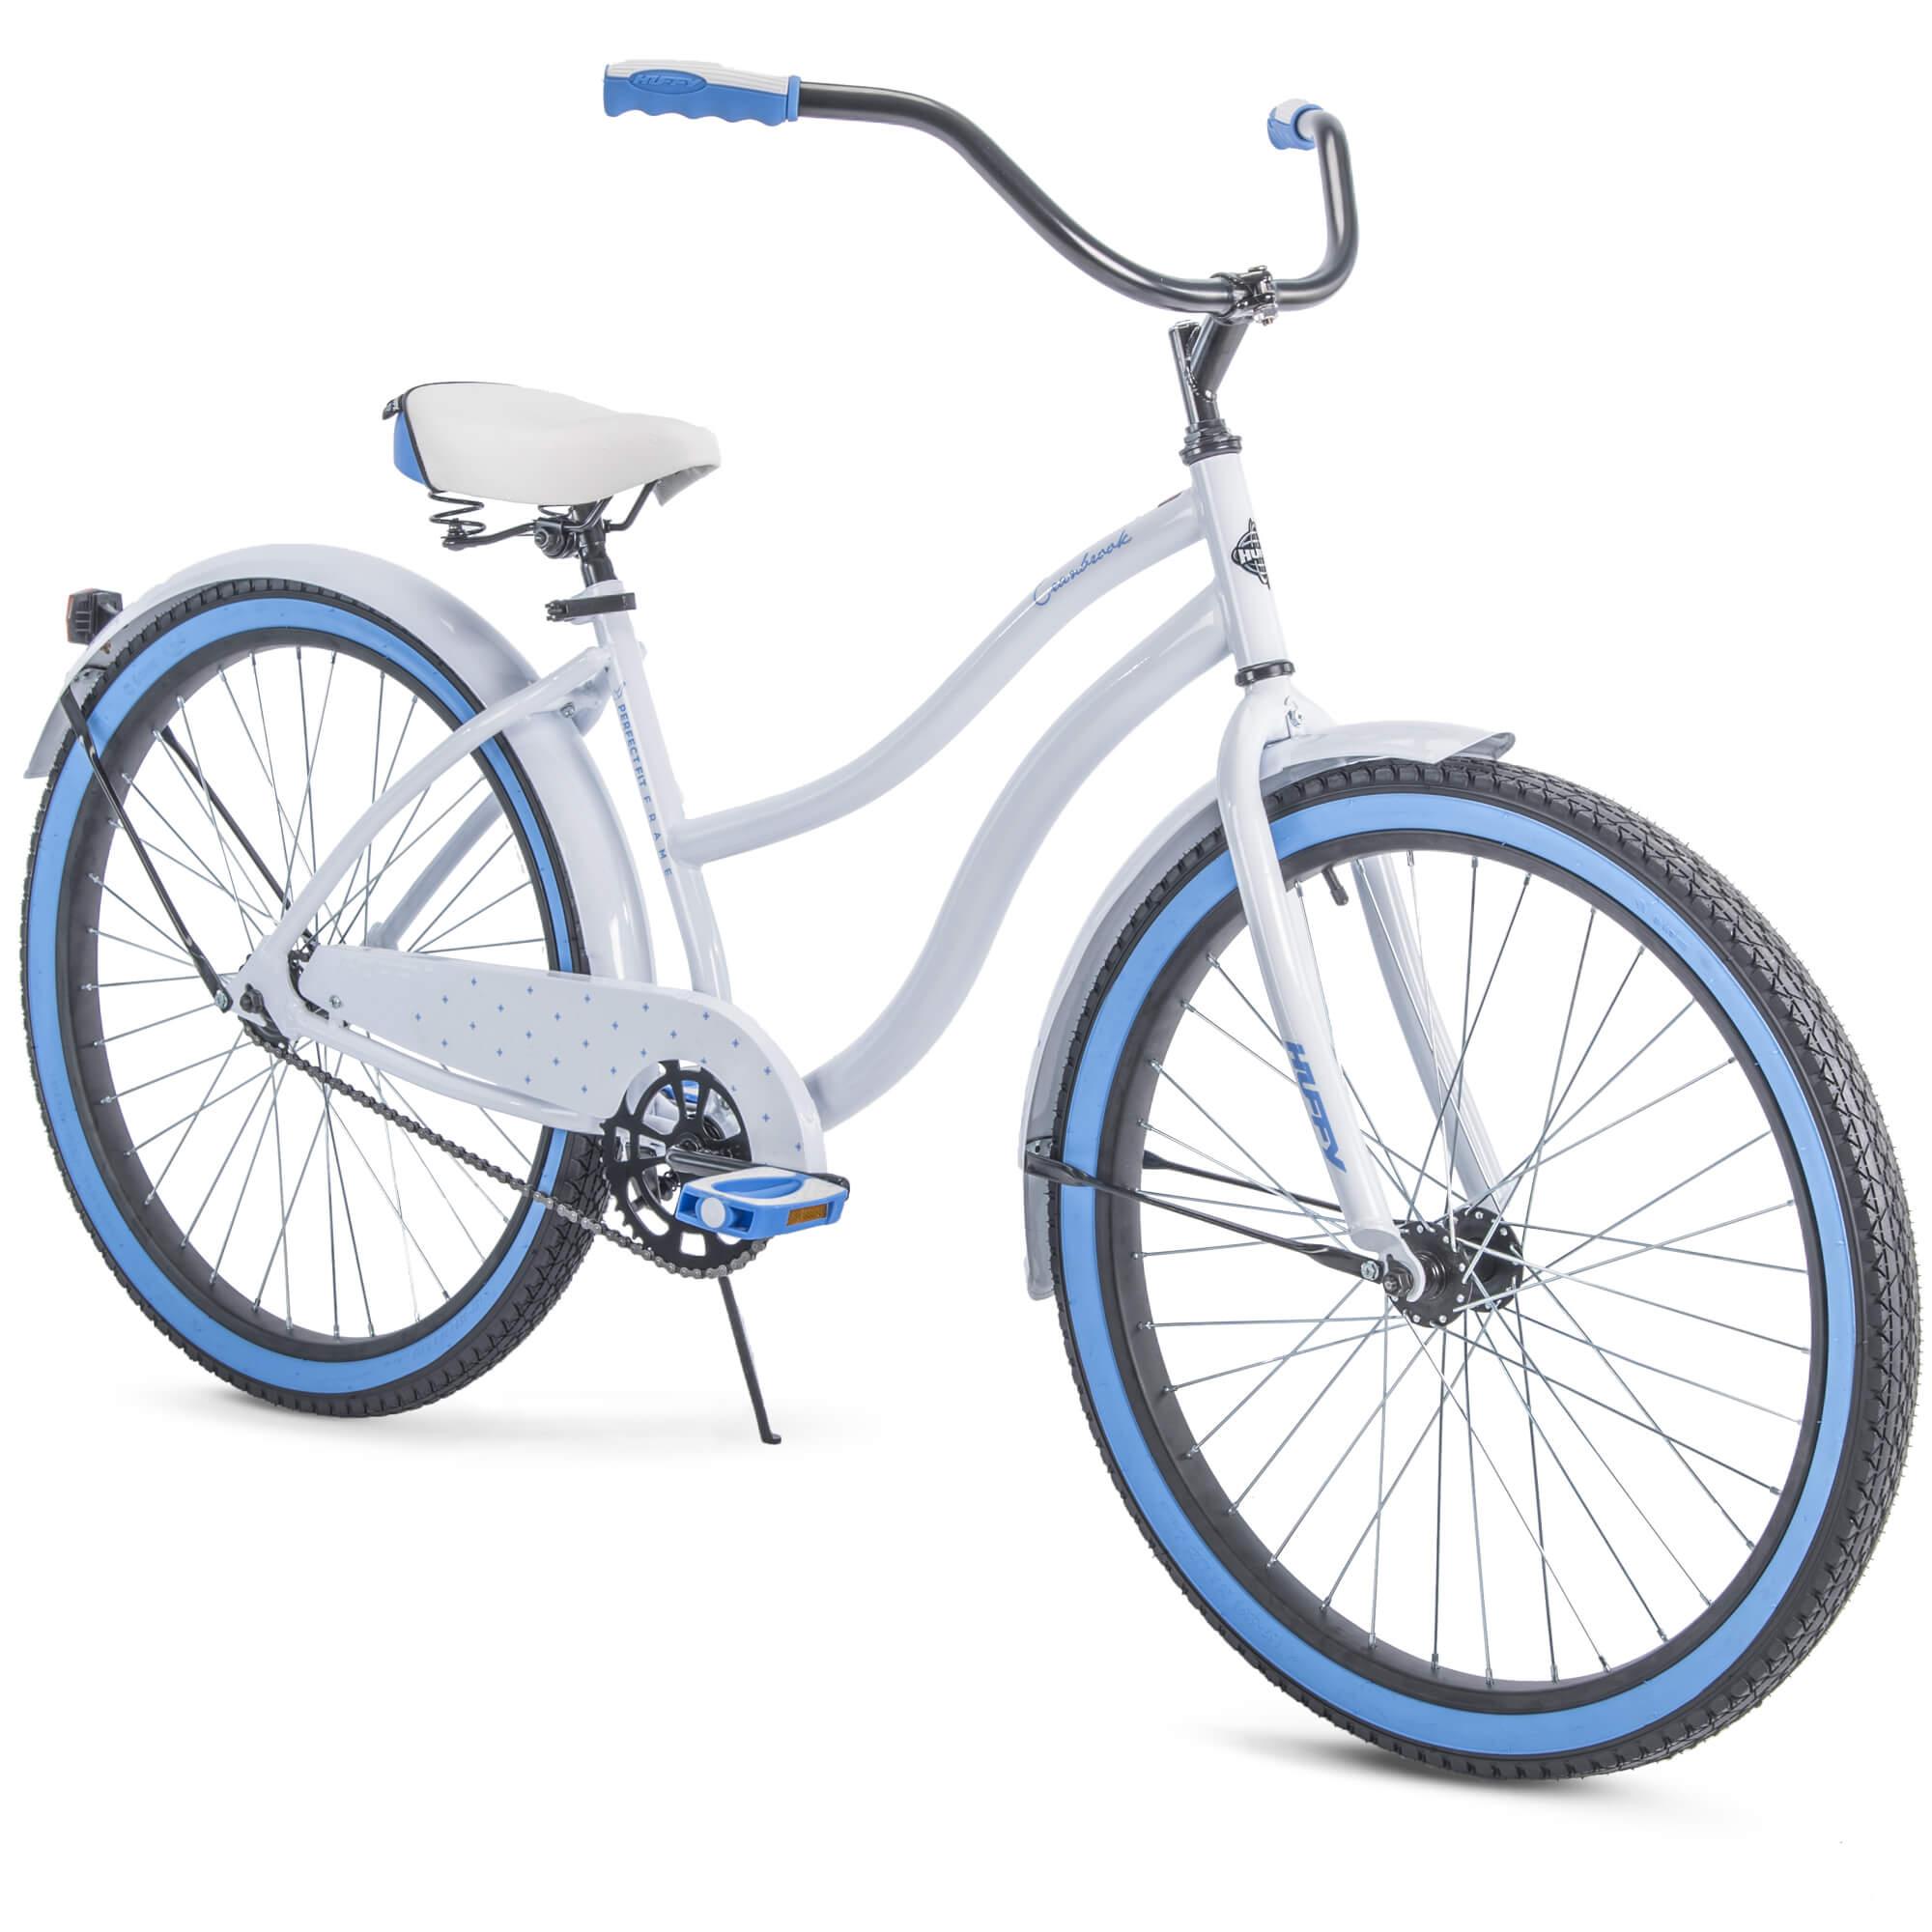 Huffy 26″ Cranbrook Women's City Cruiser Bike